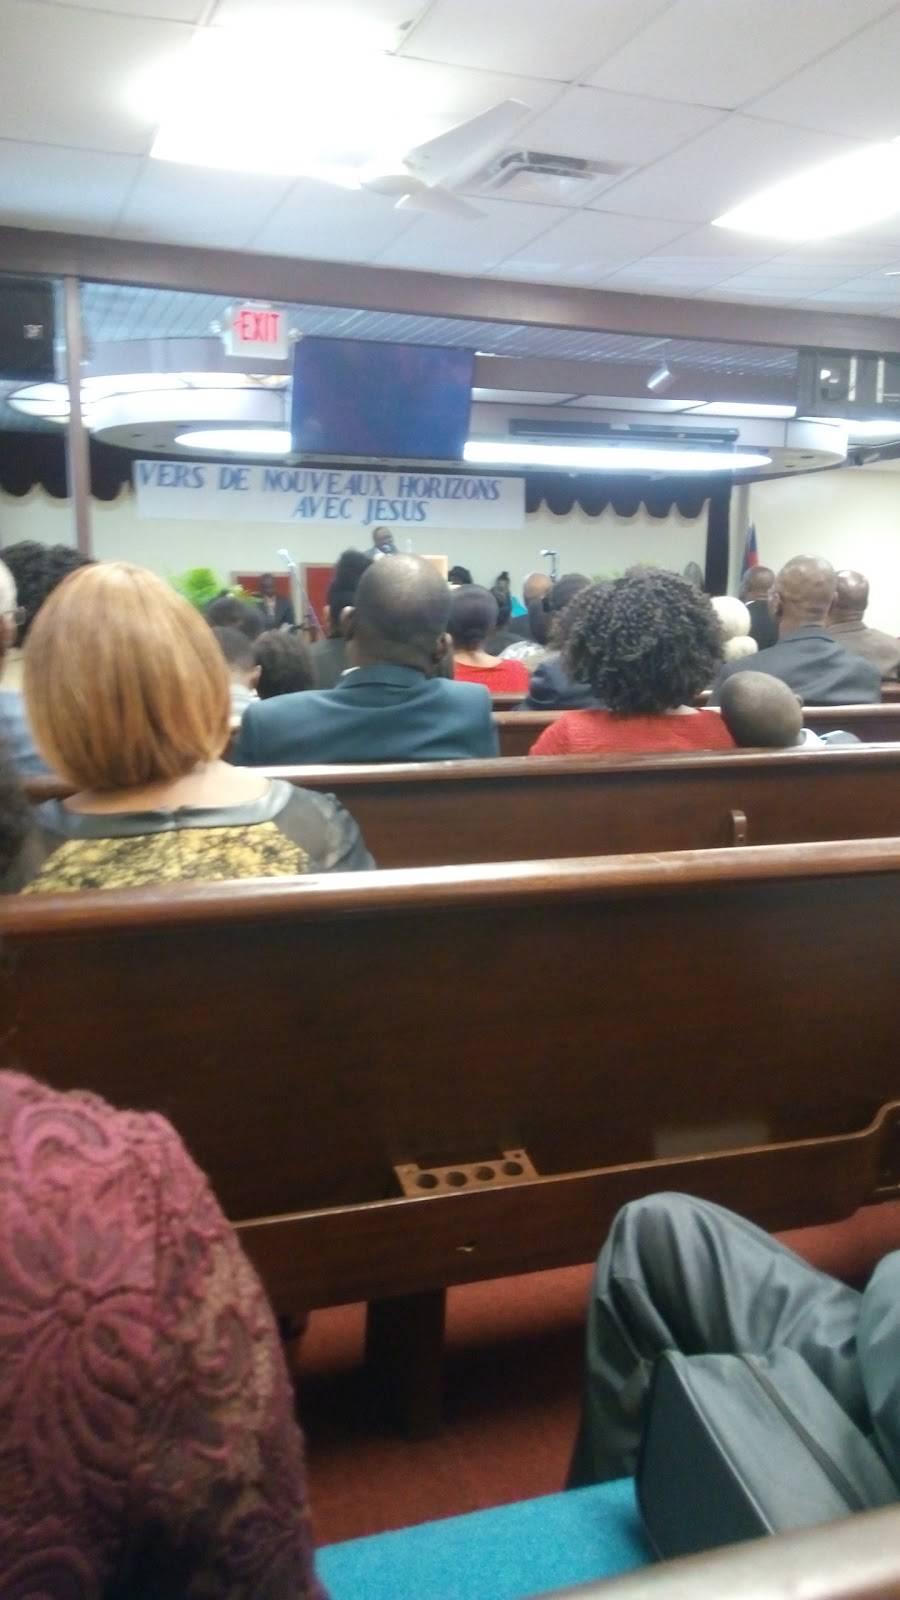 Bethsaida Seventh-day Adventist Church - church  | Photo 2 of 5 | Address: 10185 NW 7th Ave, Miami, FL 33150, USA | Phone: (305) 639-8934